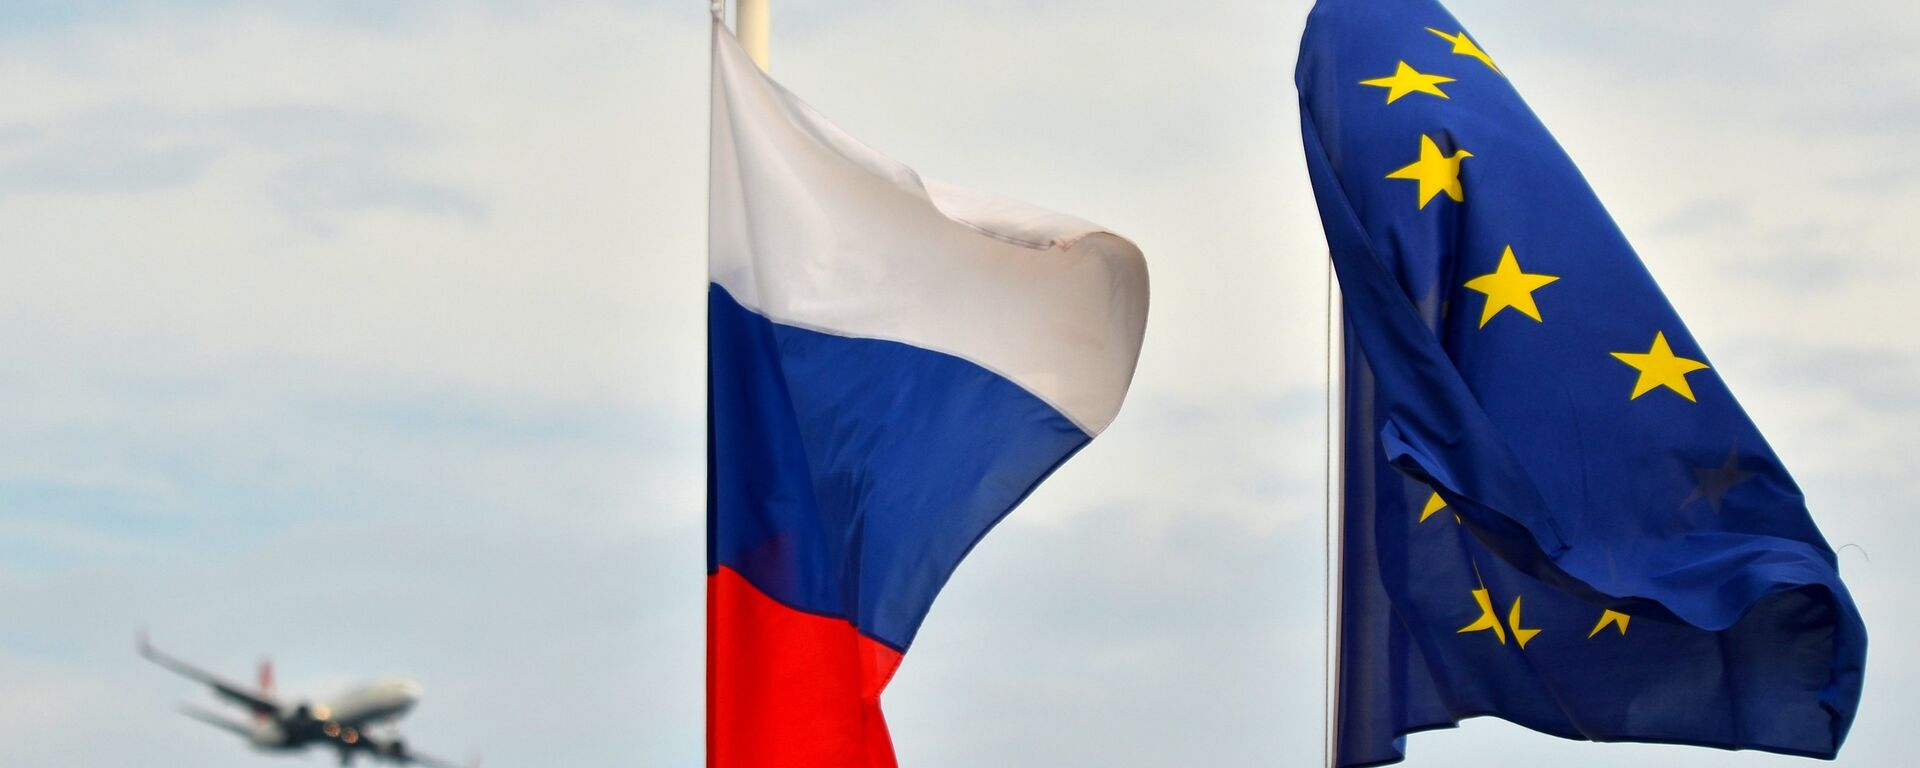 Vlajka Ruska a vlajka EU - Sputnik Česká republika, 1920, 11.08.2021